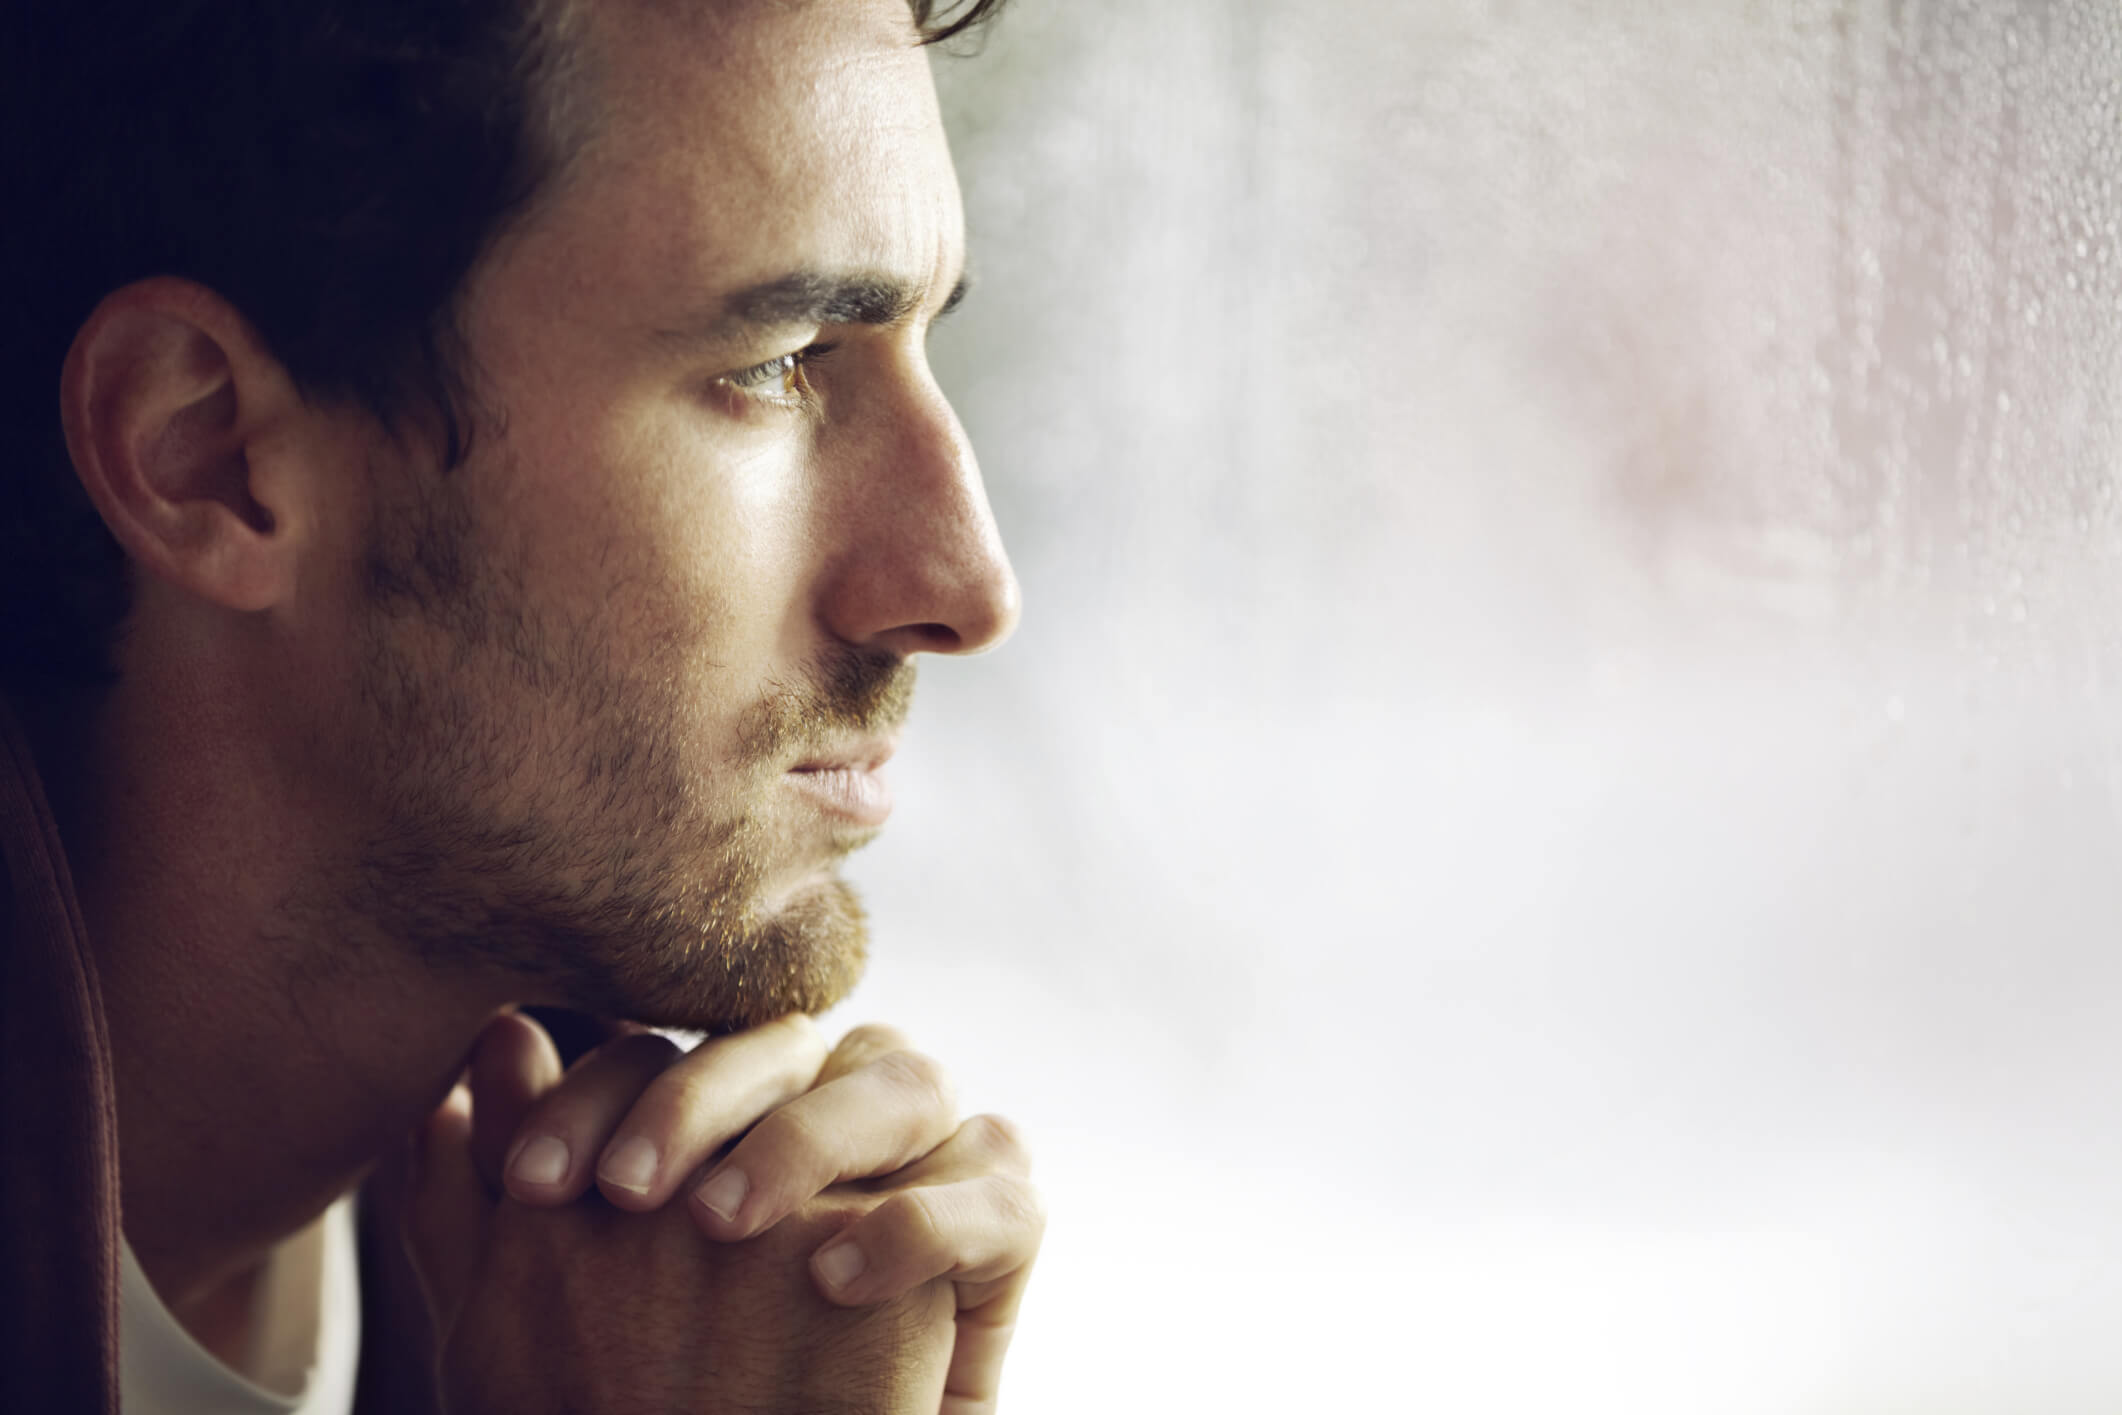 A young man looking sad